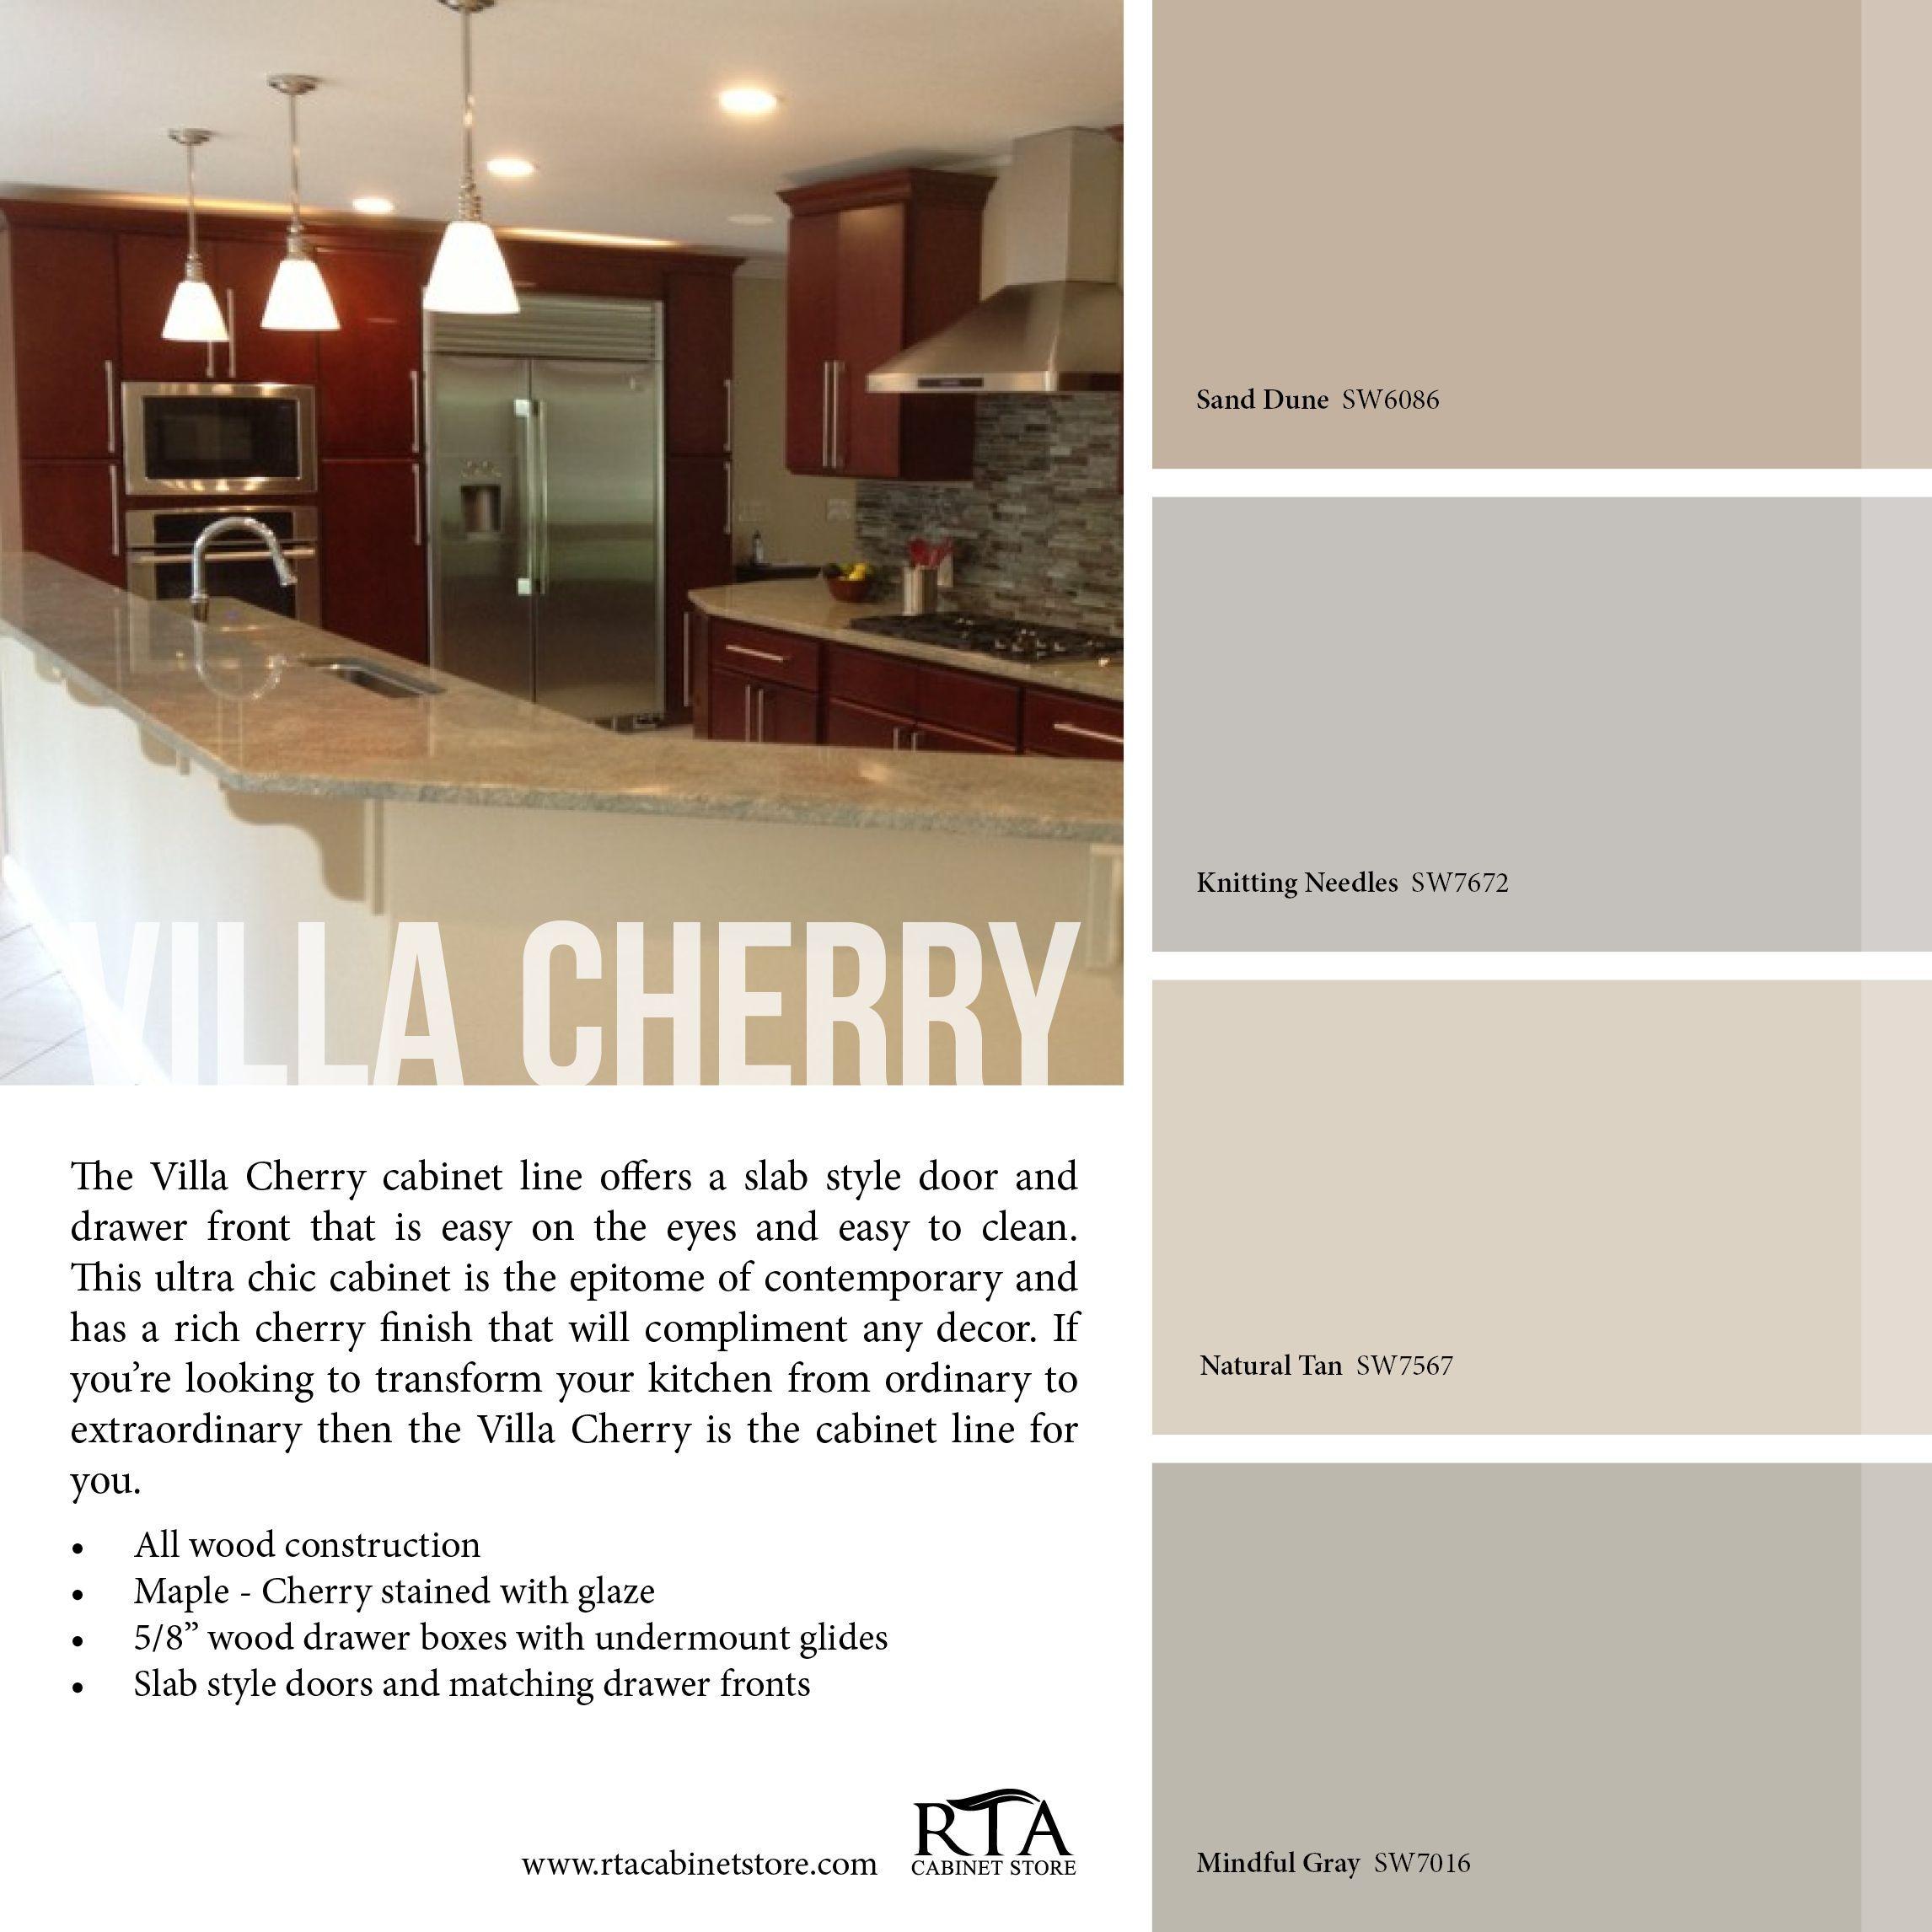 Color Palette To Go With Our Villa Cherry Kitchen Cabinet Line Cherry Is Pret Kitchen Paint Colors With Cherry Cherry Wood Cabinets Cherry Wood Kitchens